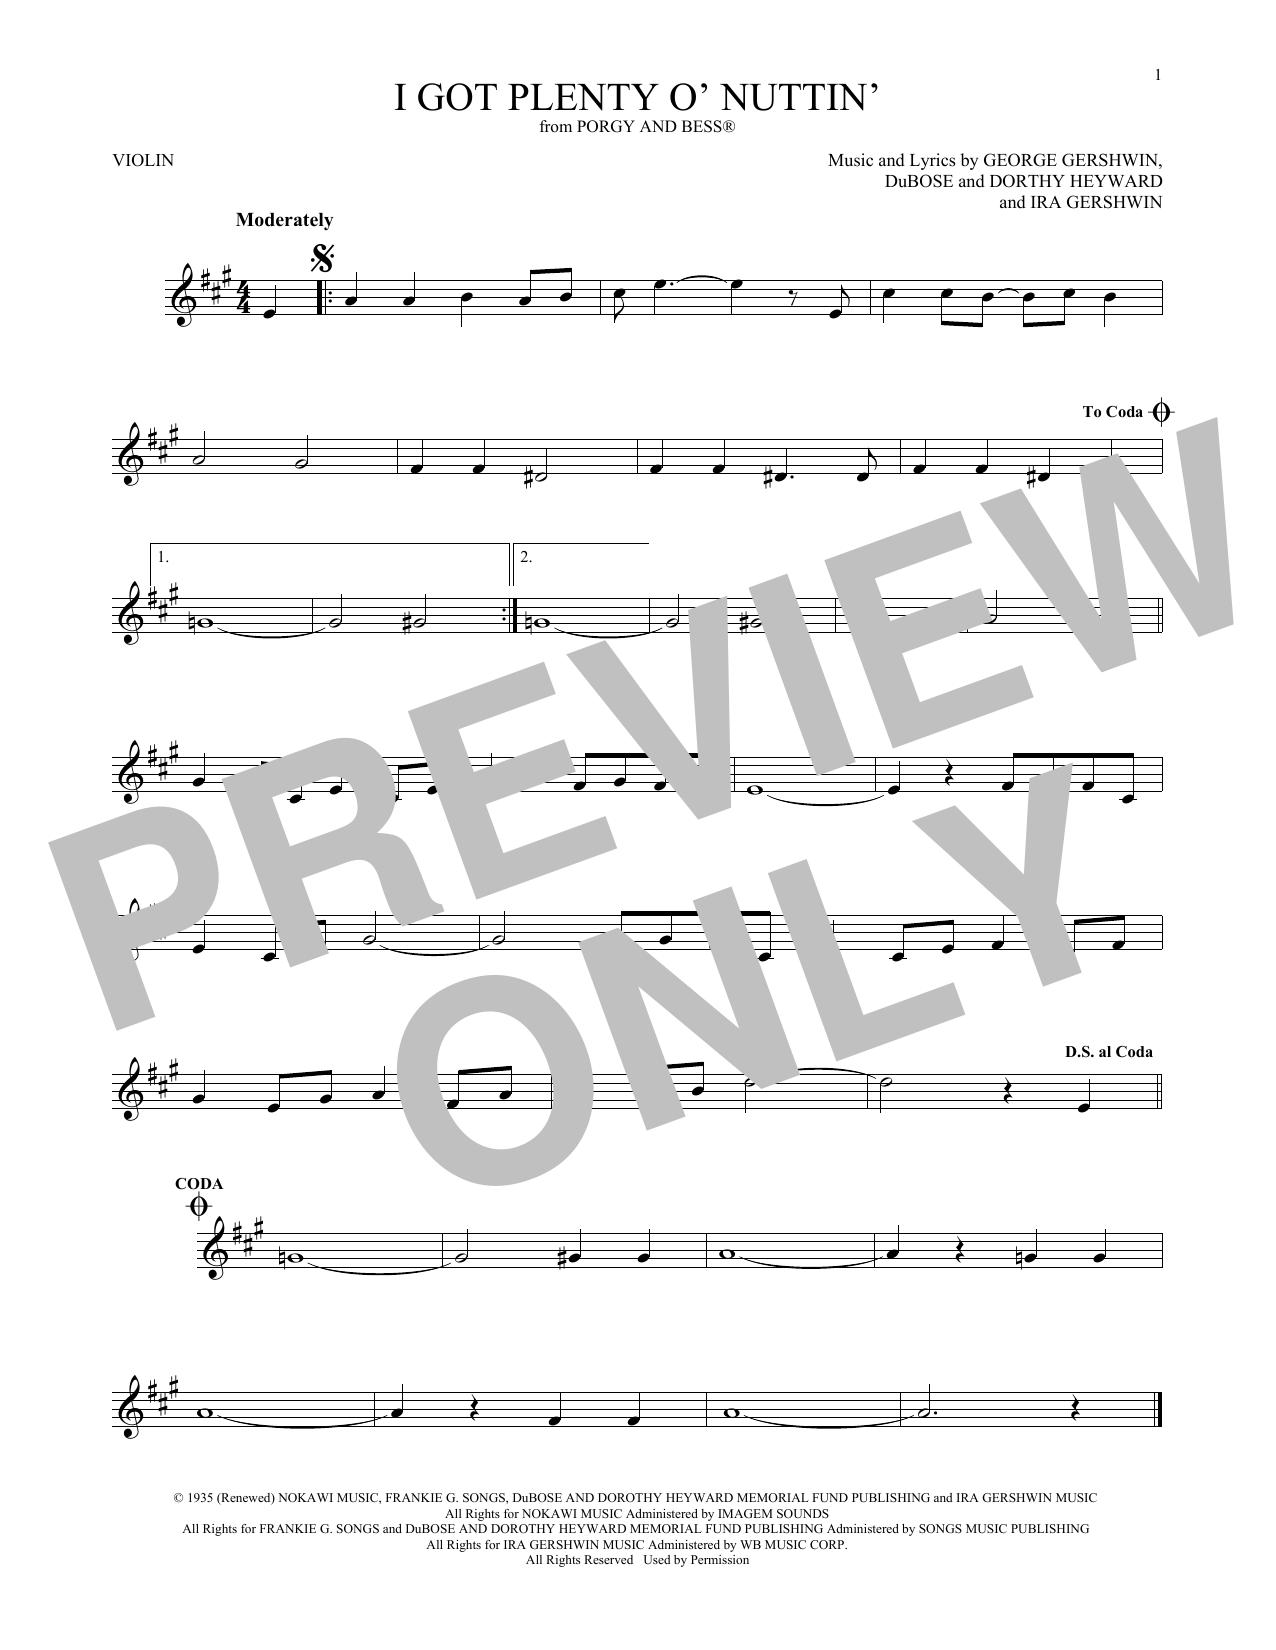 I Got Plenty O' Nuttin' (Violin Solo)